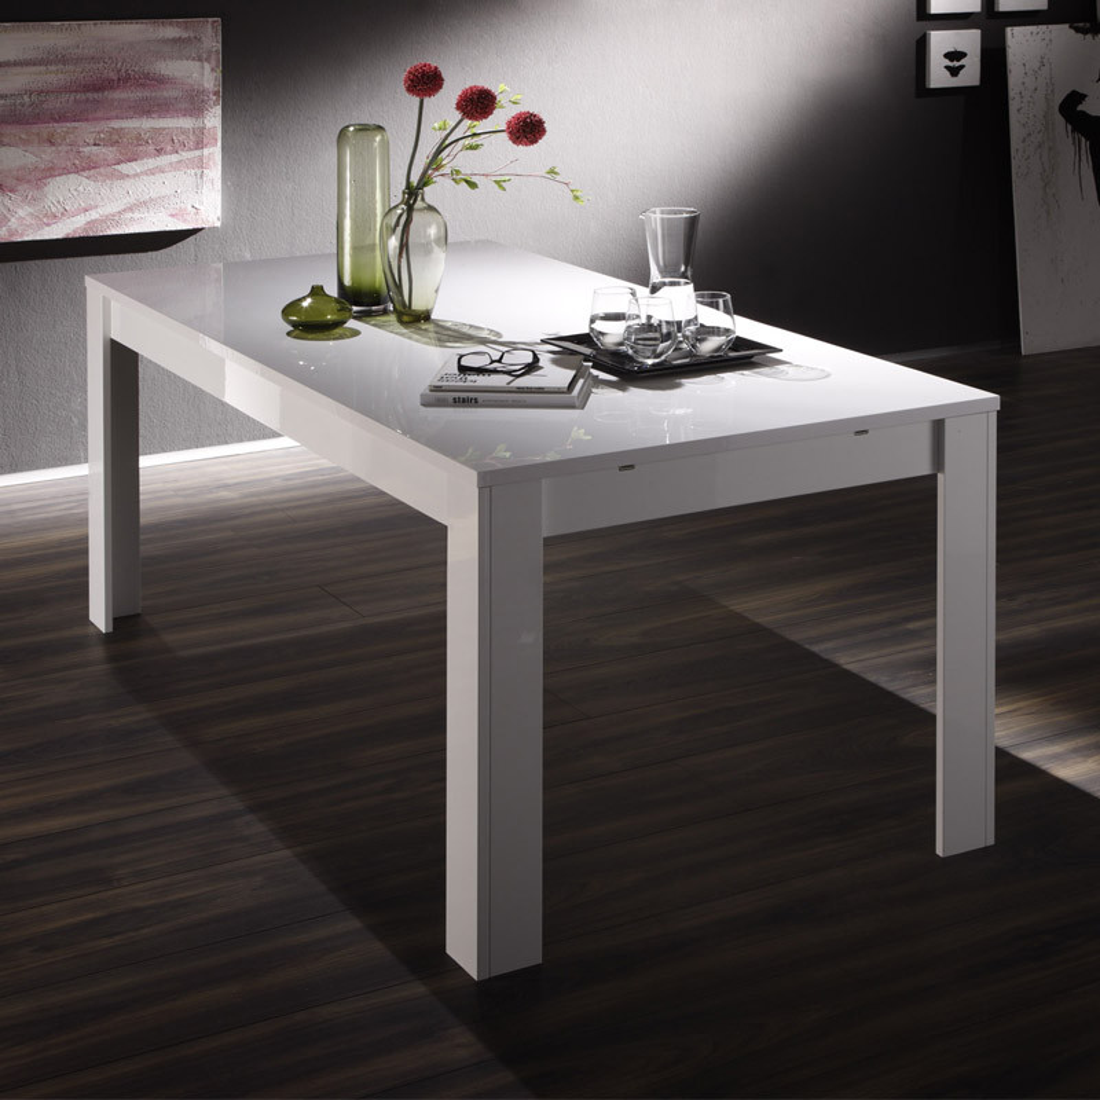 Table de repas à allonge laqué Blanc brillant - TRANI